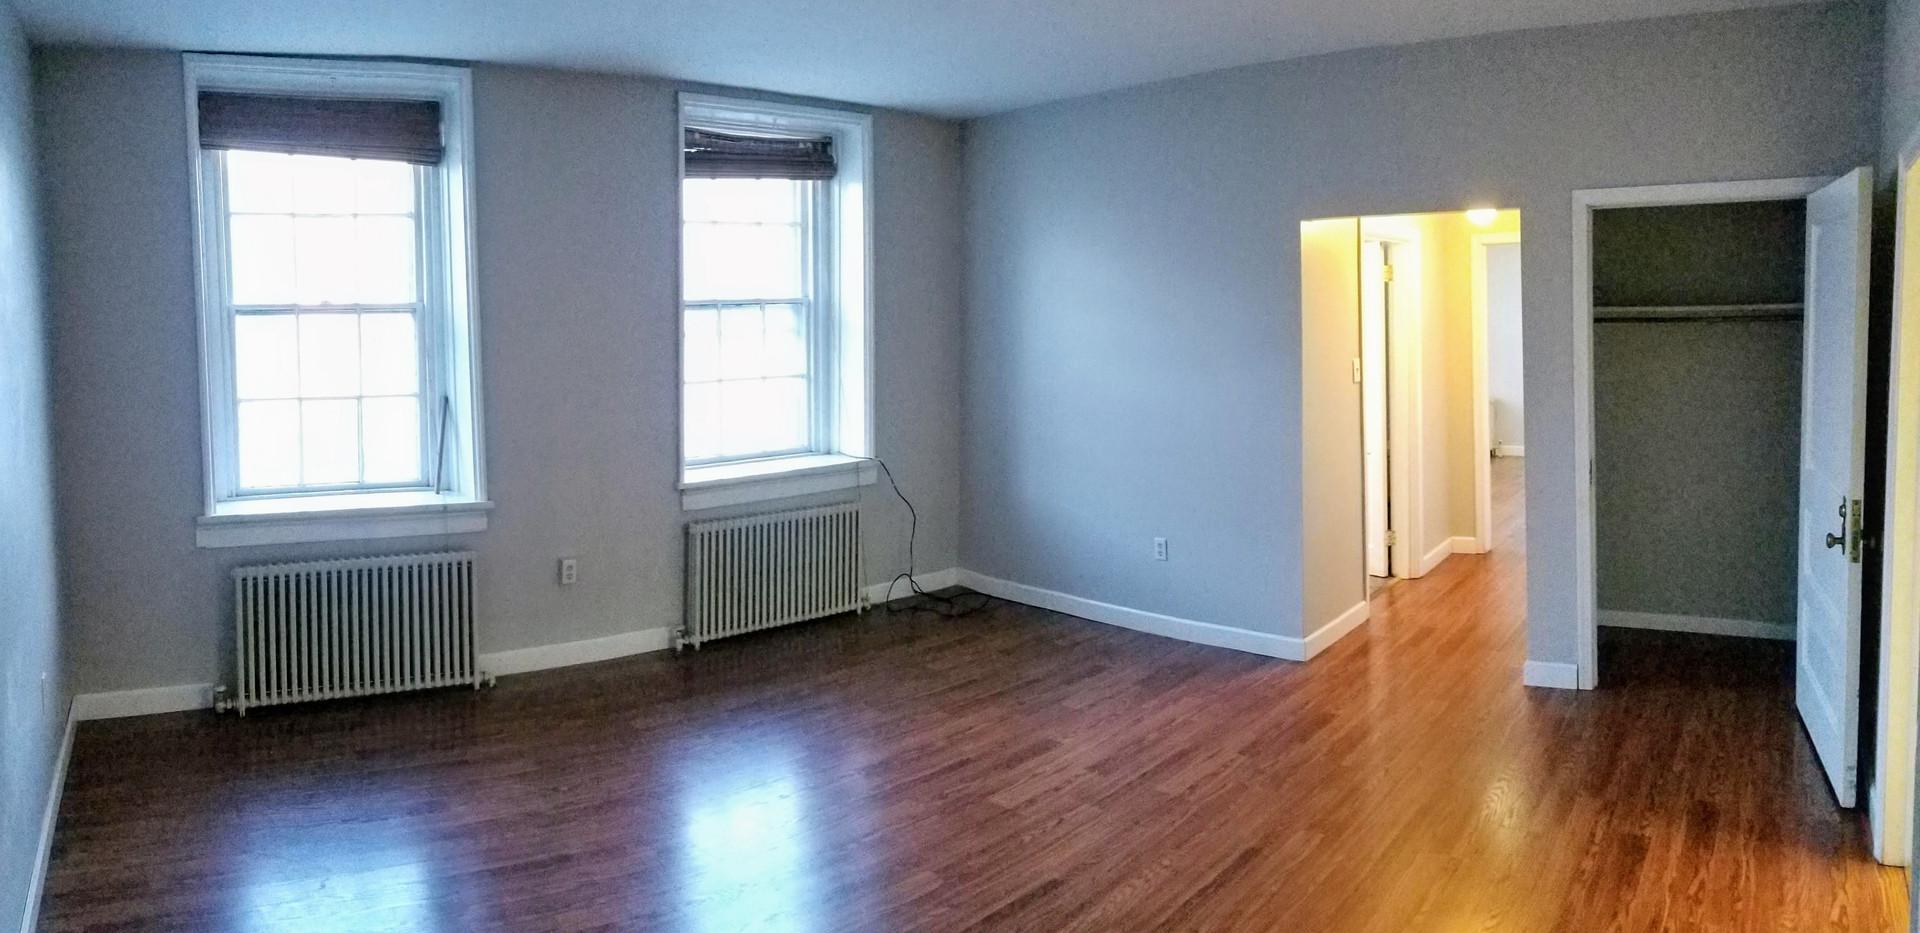 living room pano (2).jpg